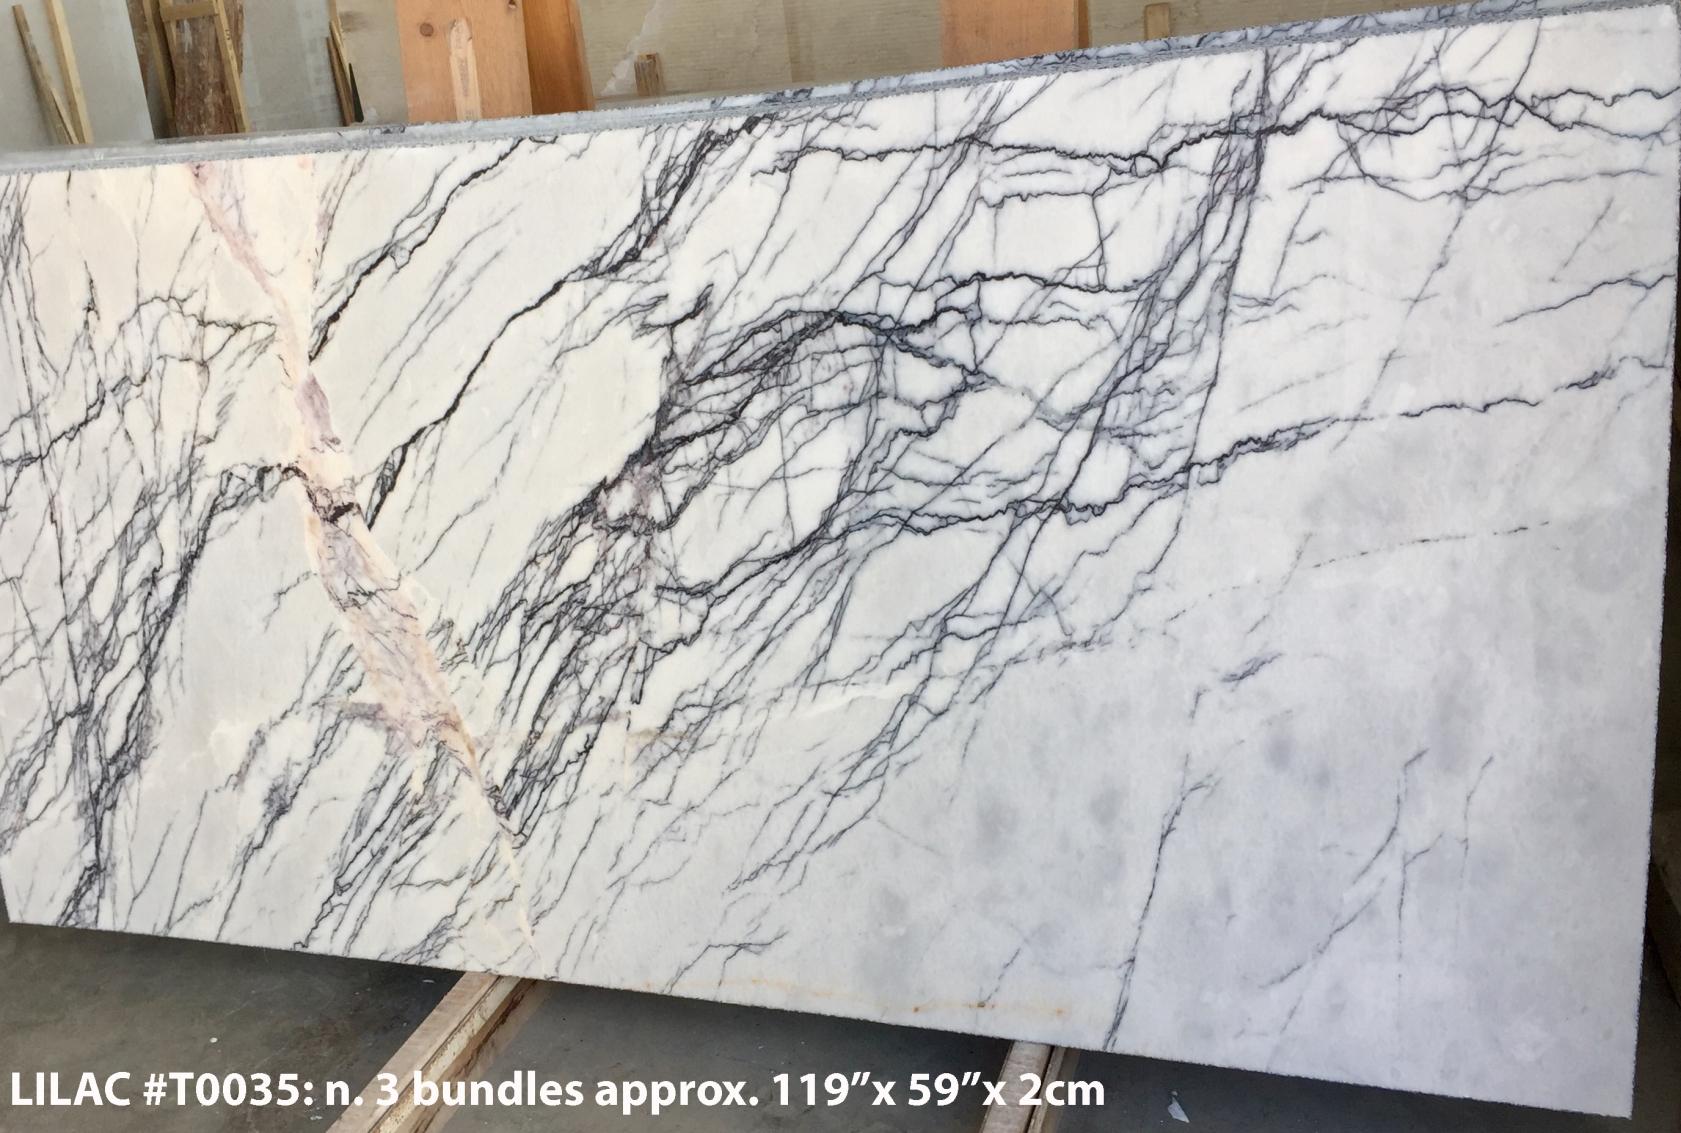 LILAC Suministro Verona (Italia) de planchas mates en mármol natural AA T0035